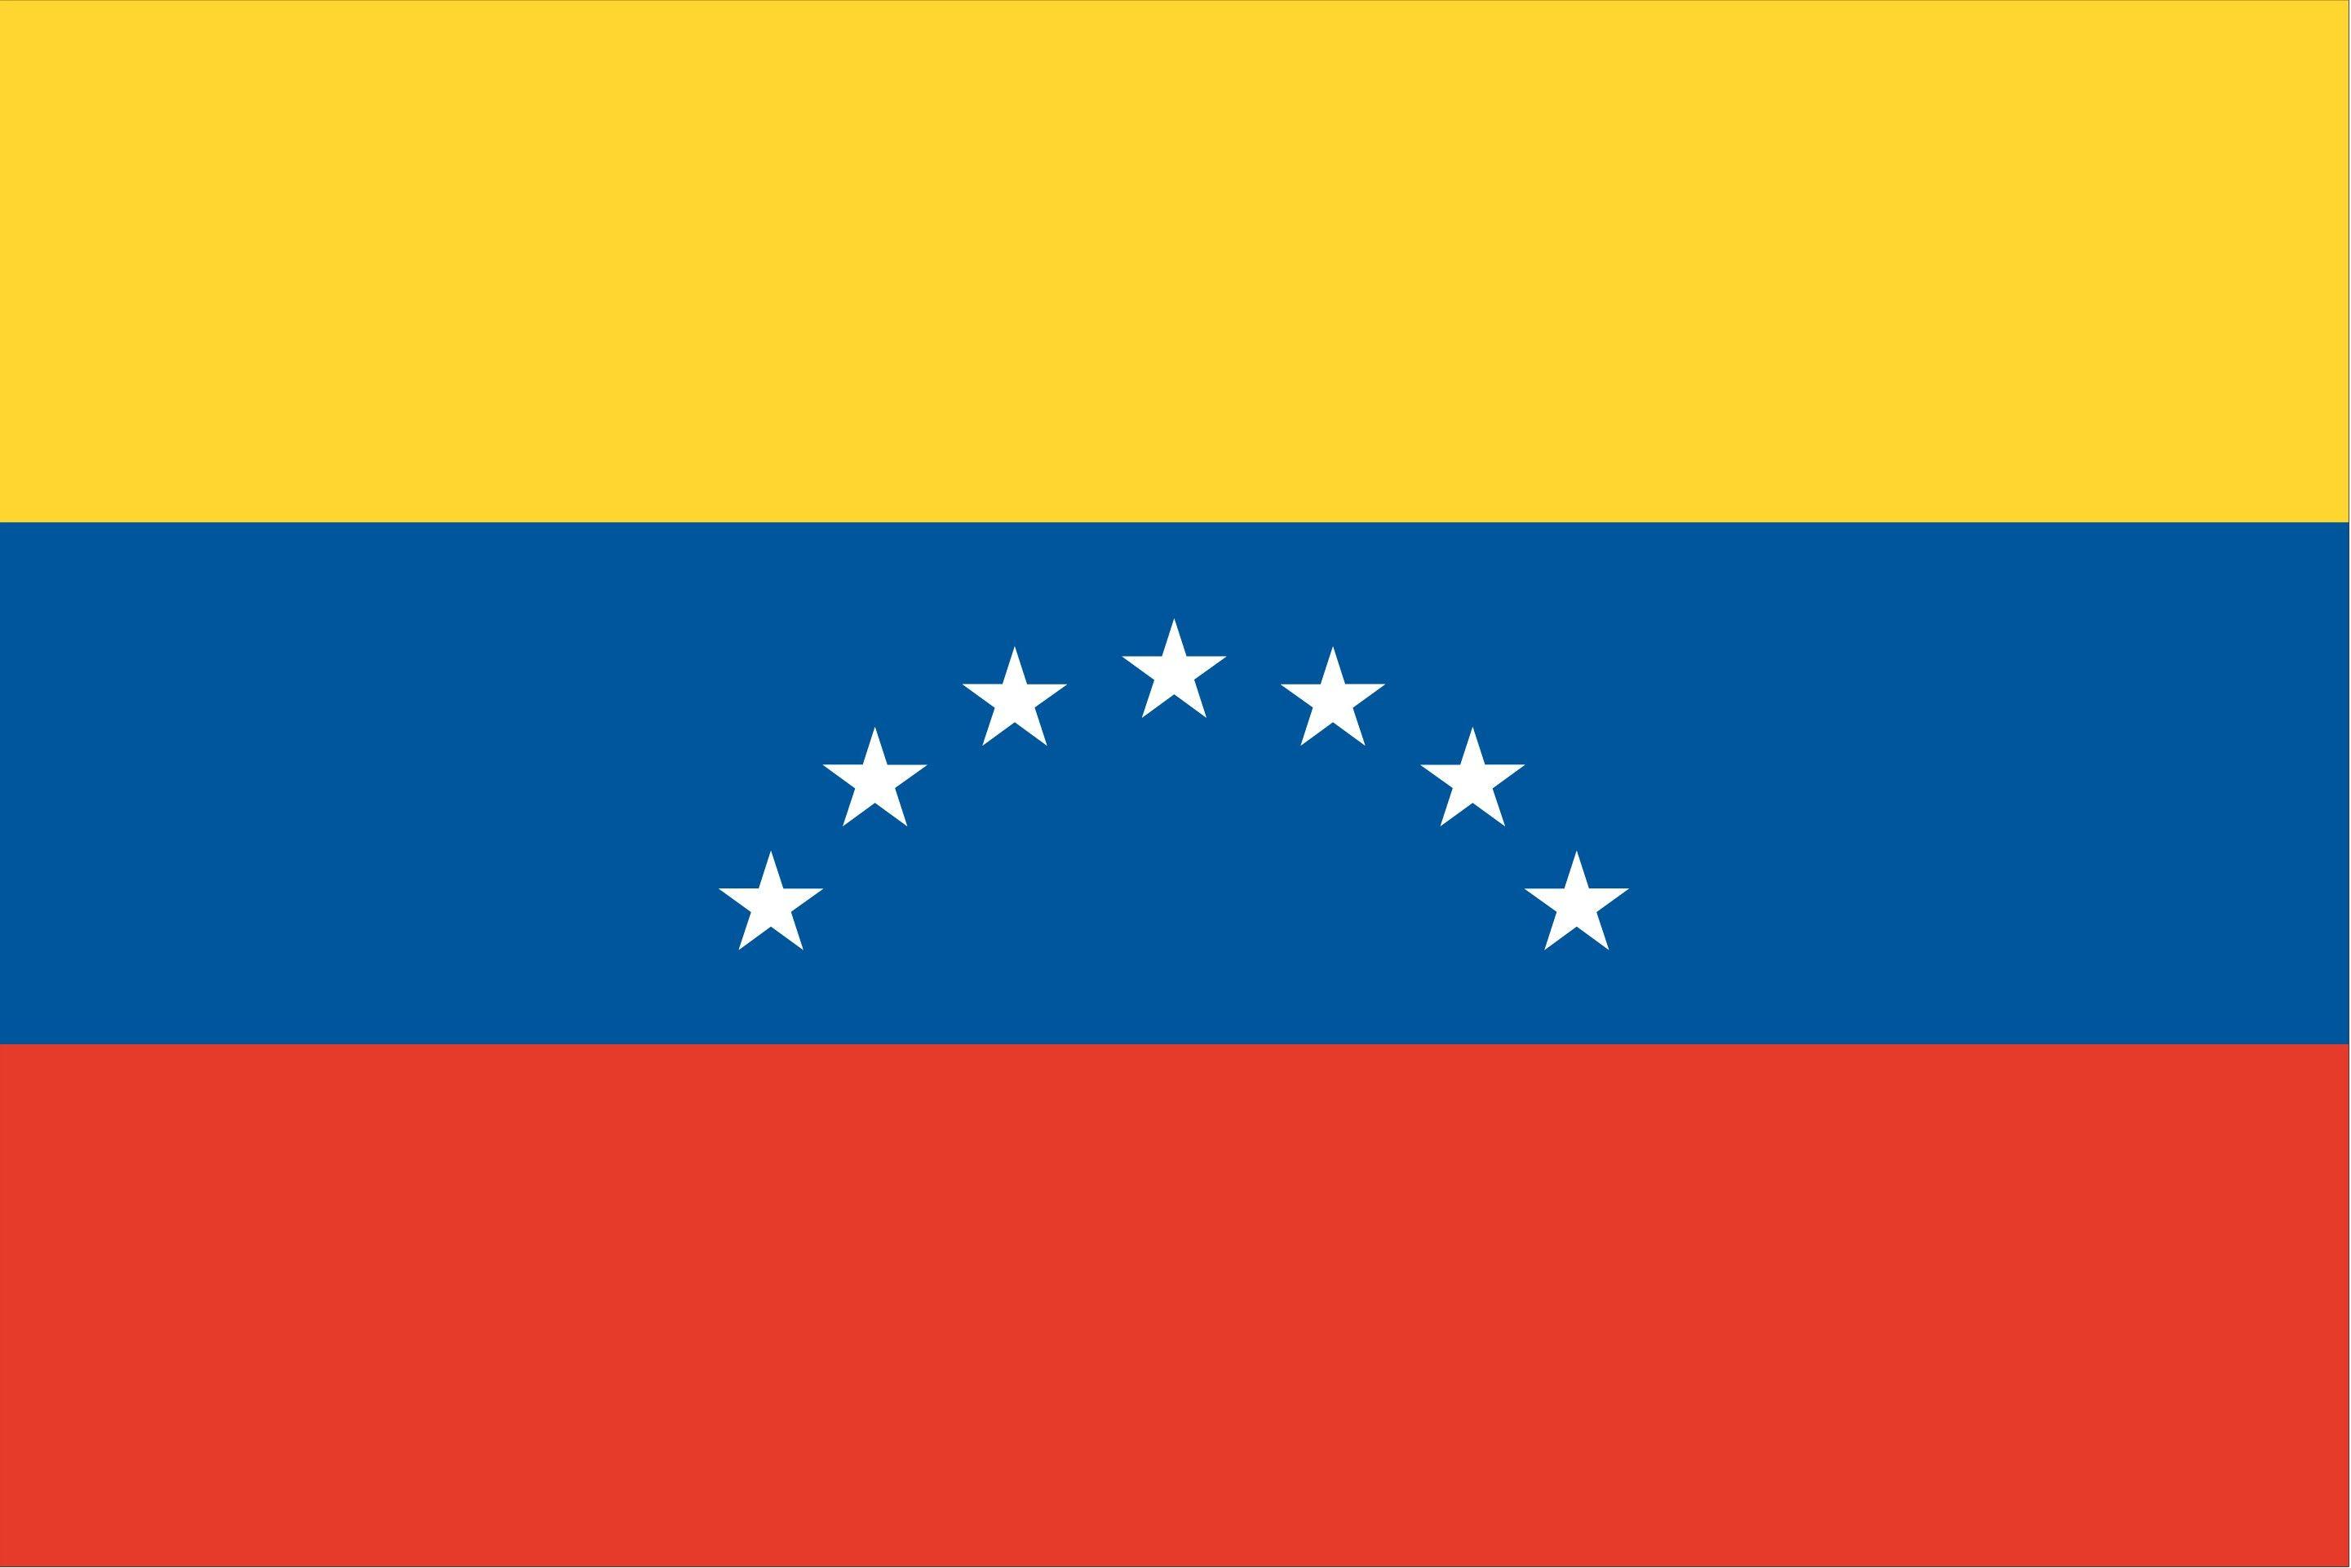 Venezuala personals Venezuela Gay Personals, Venezuela Gay Dating Site, Venezuela Gay Singles, Free Online Dating